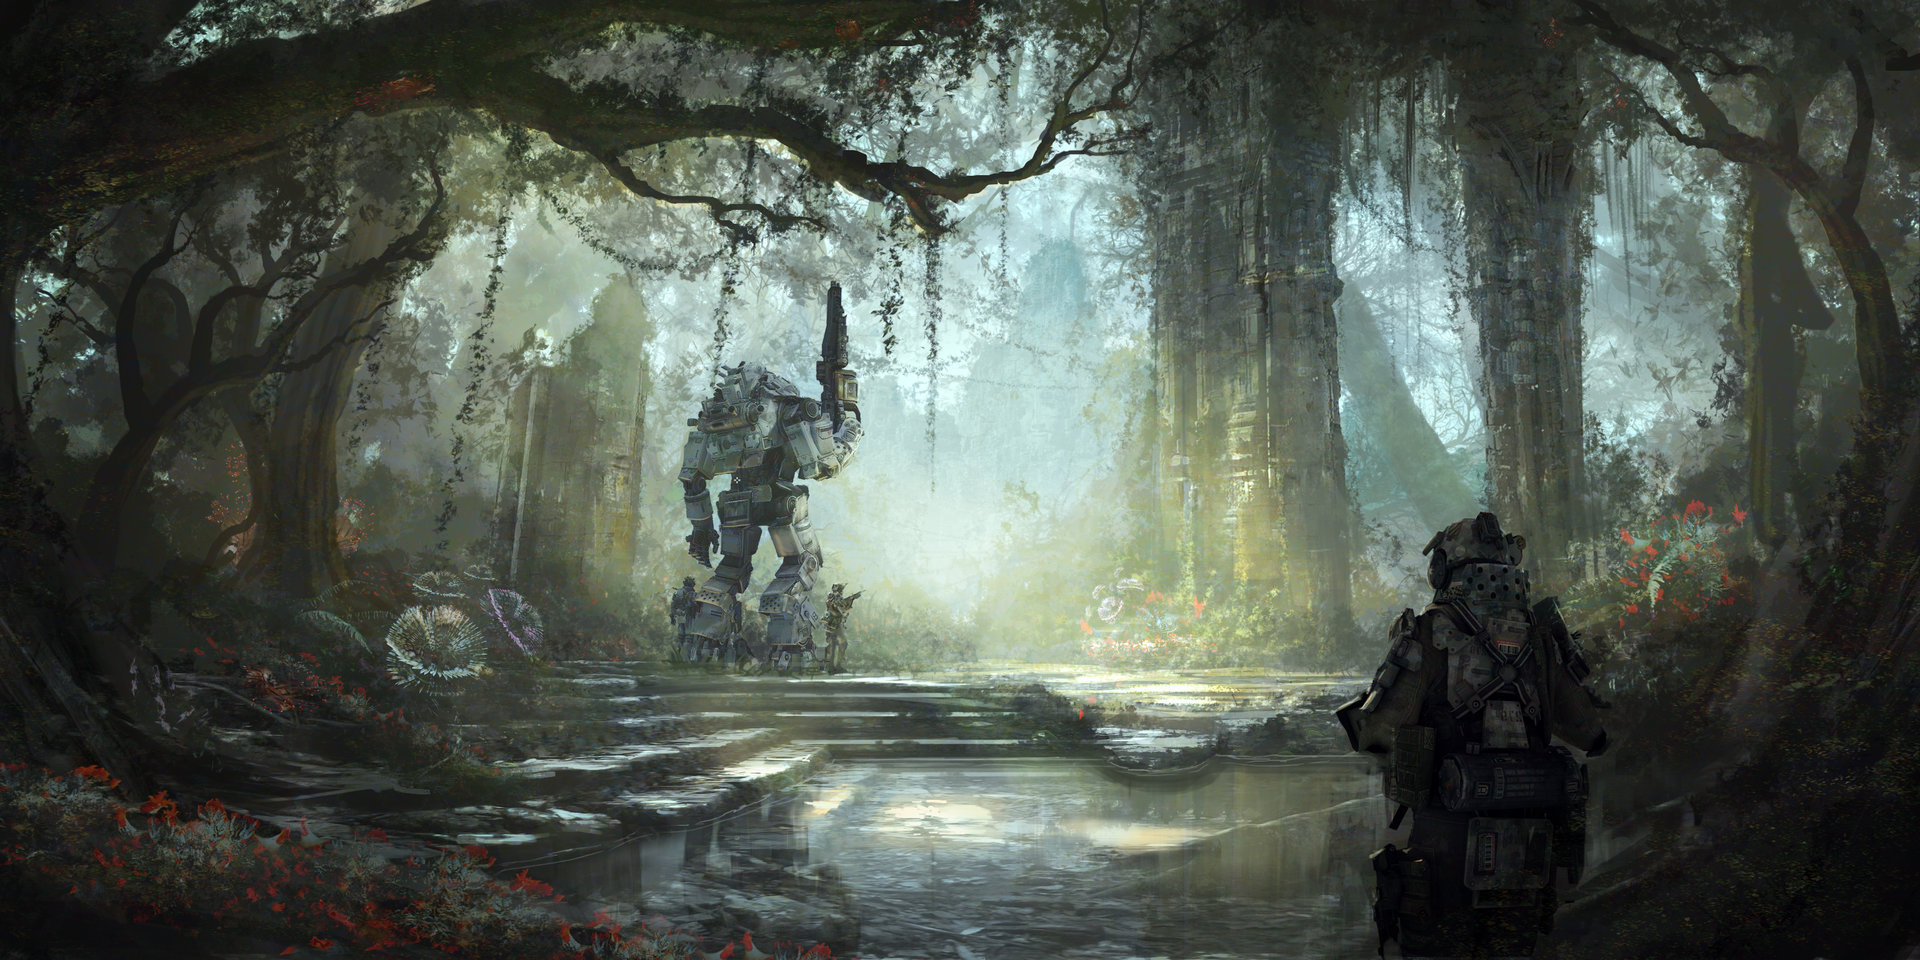 Tu bui swamp day temple